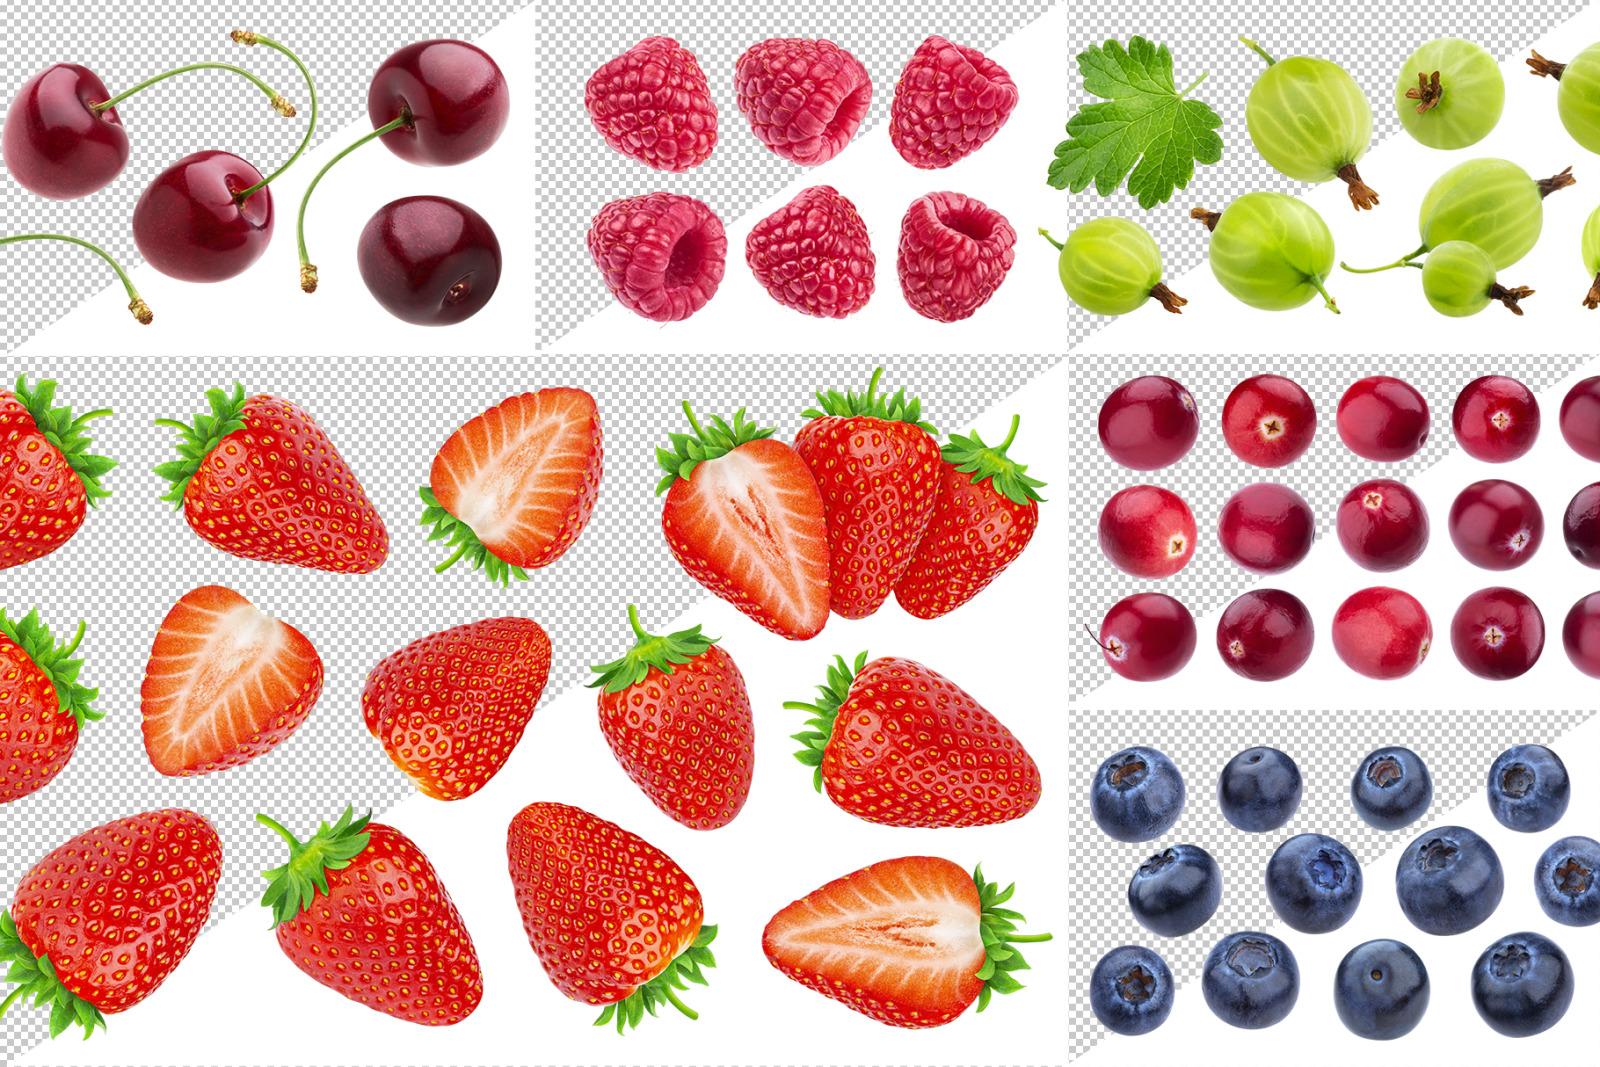 Fruits on transparent background